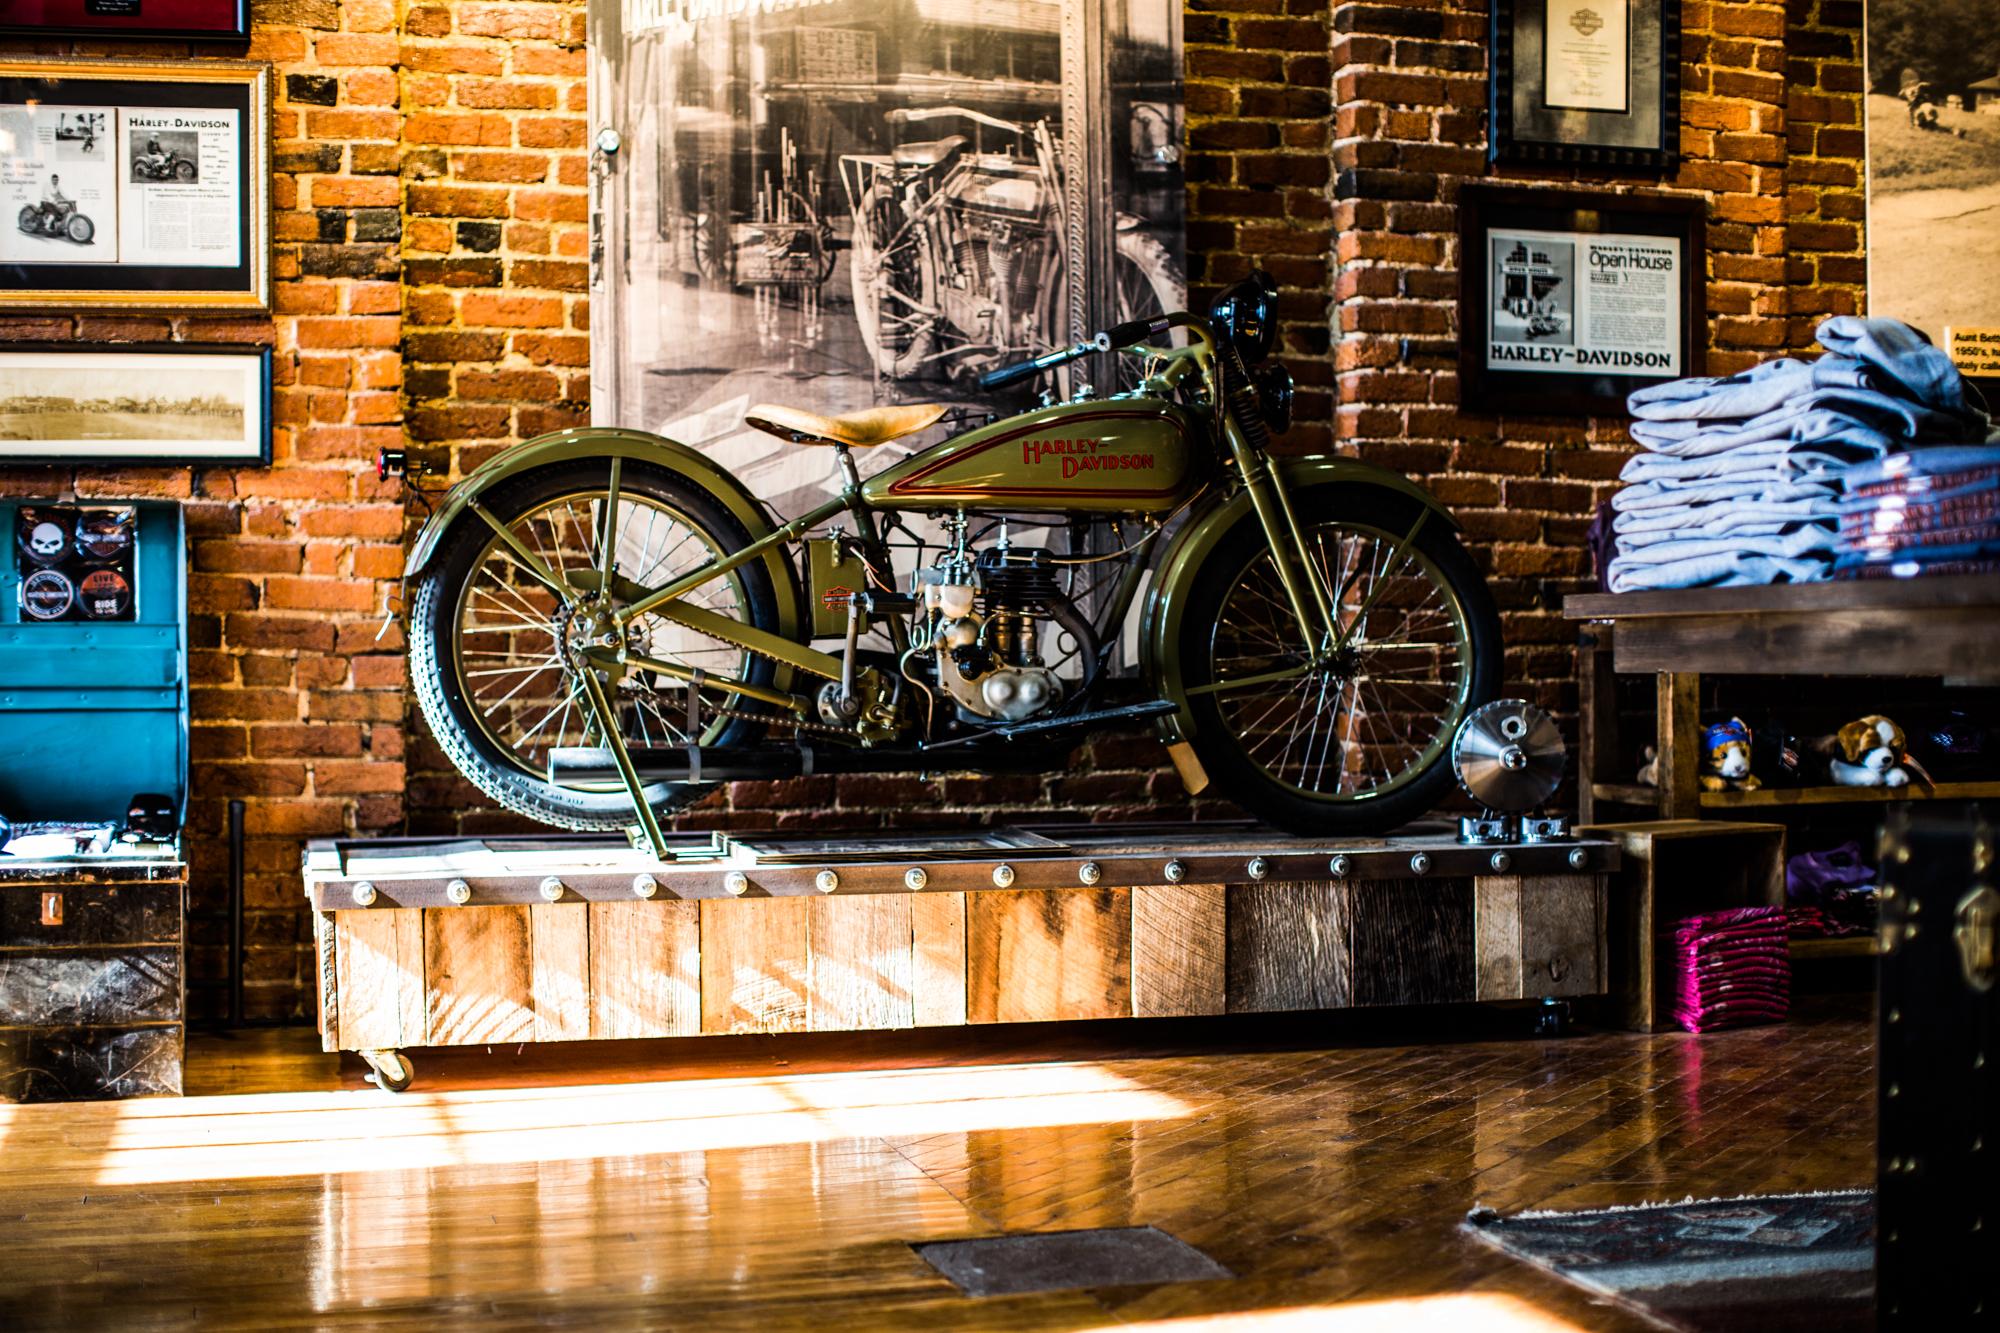 Harley Davidson -